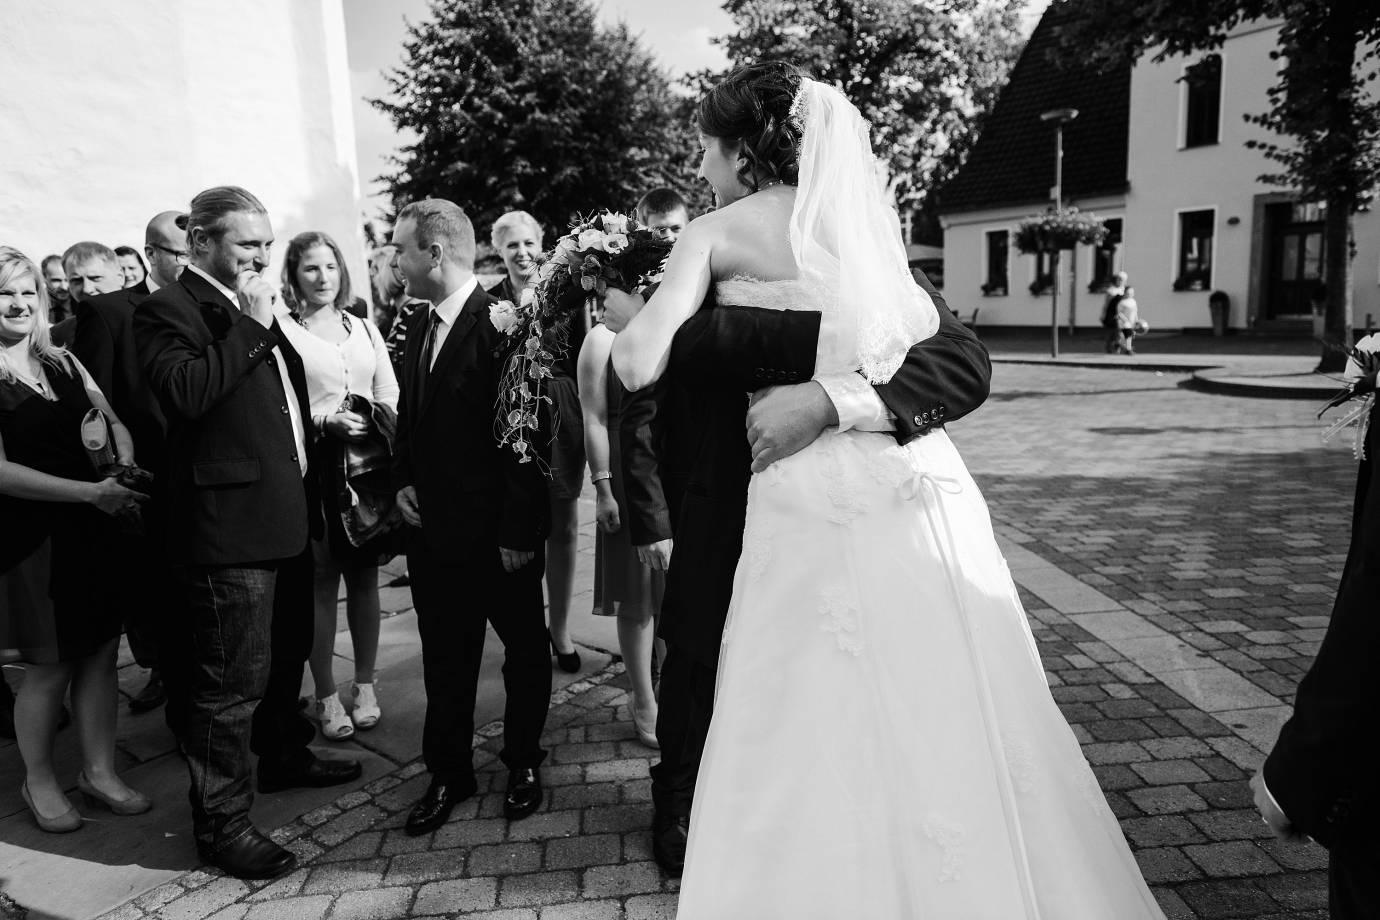 hochzeitsfotograf ohz 068 - Johanna+Sascha